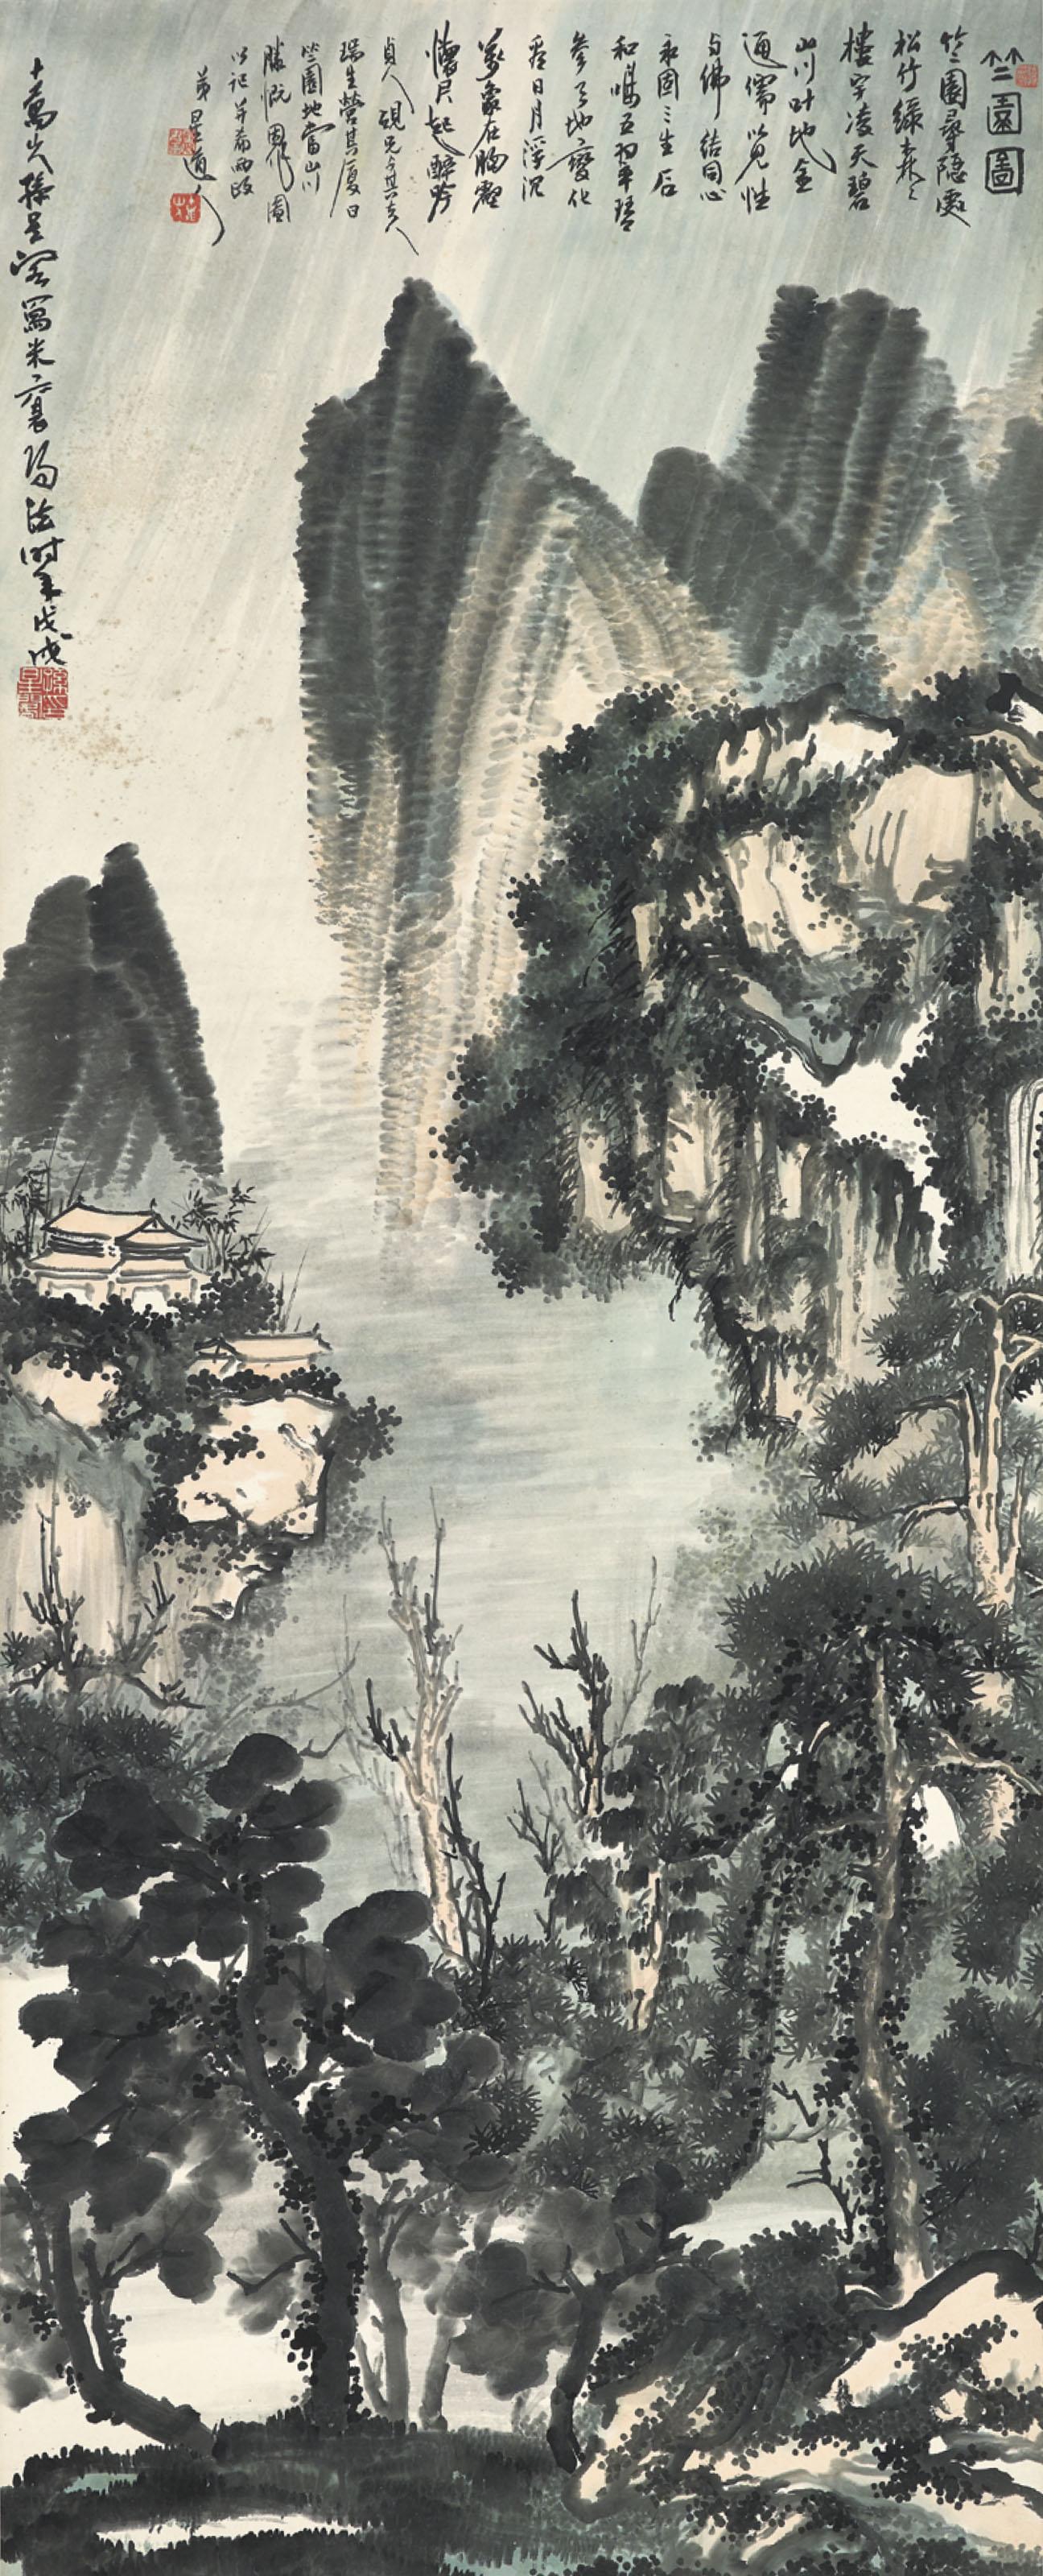 SUN XINGGE (1897-1996)